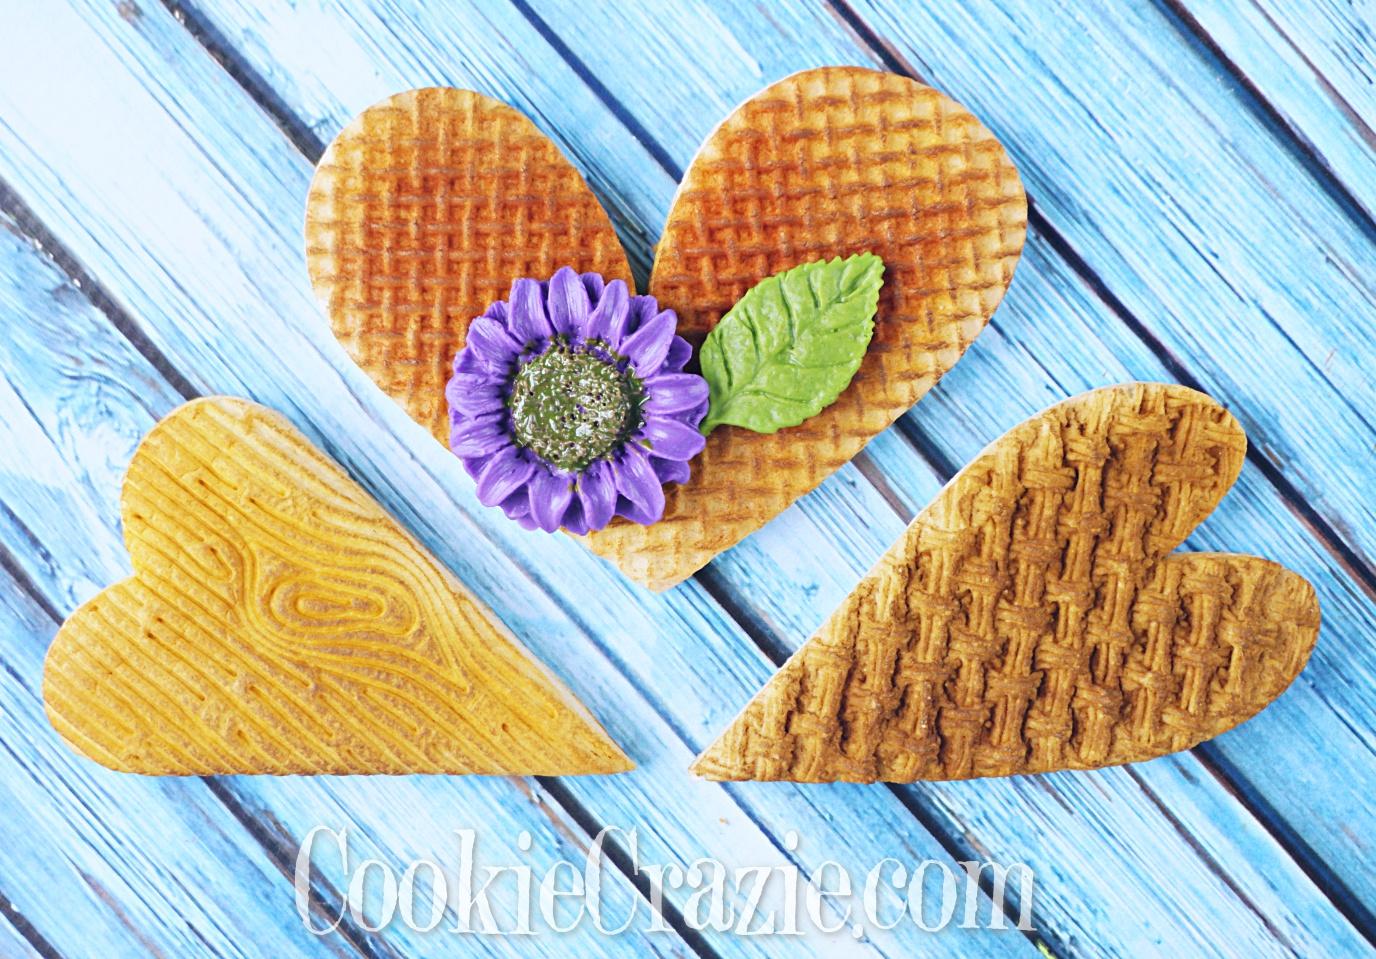 Basket, Burlap & Woodgrain Valentines Heart Decorated Sugar Cookies YouTube video  HERE